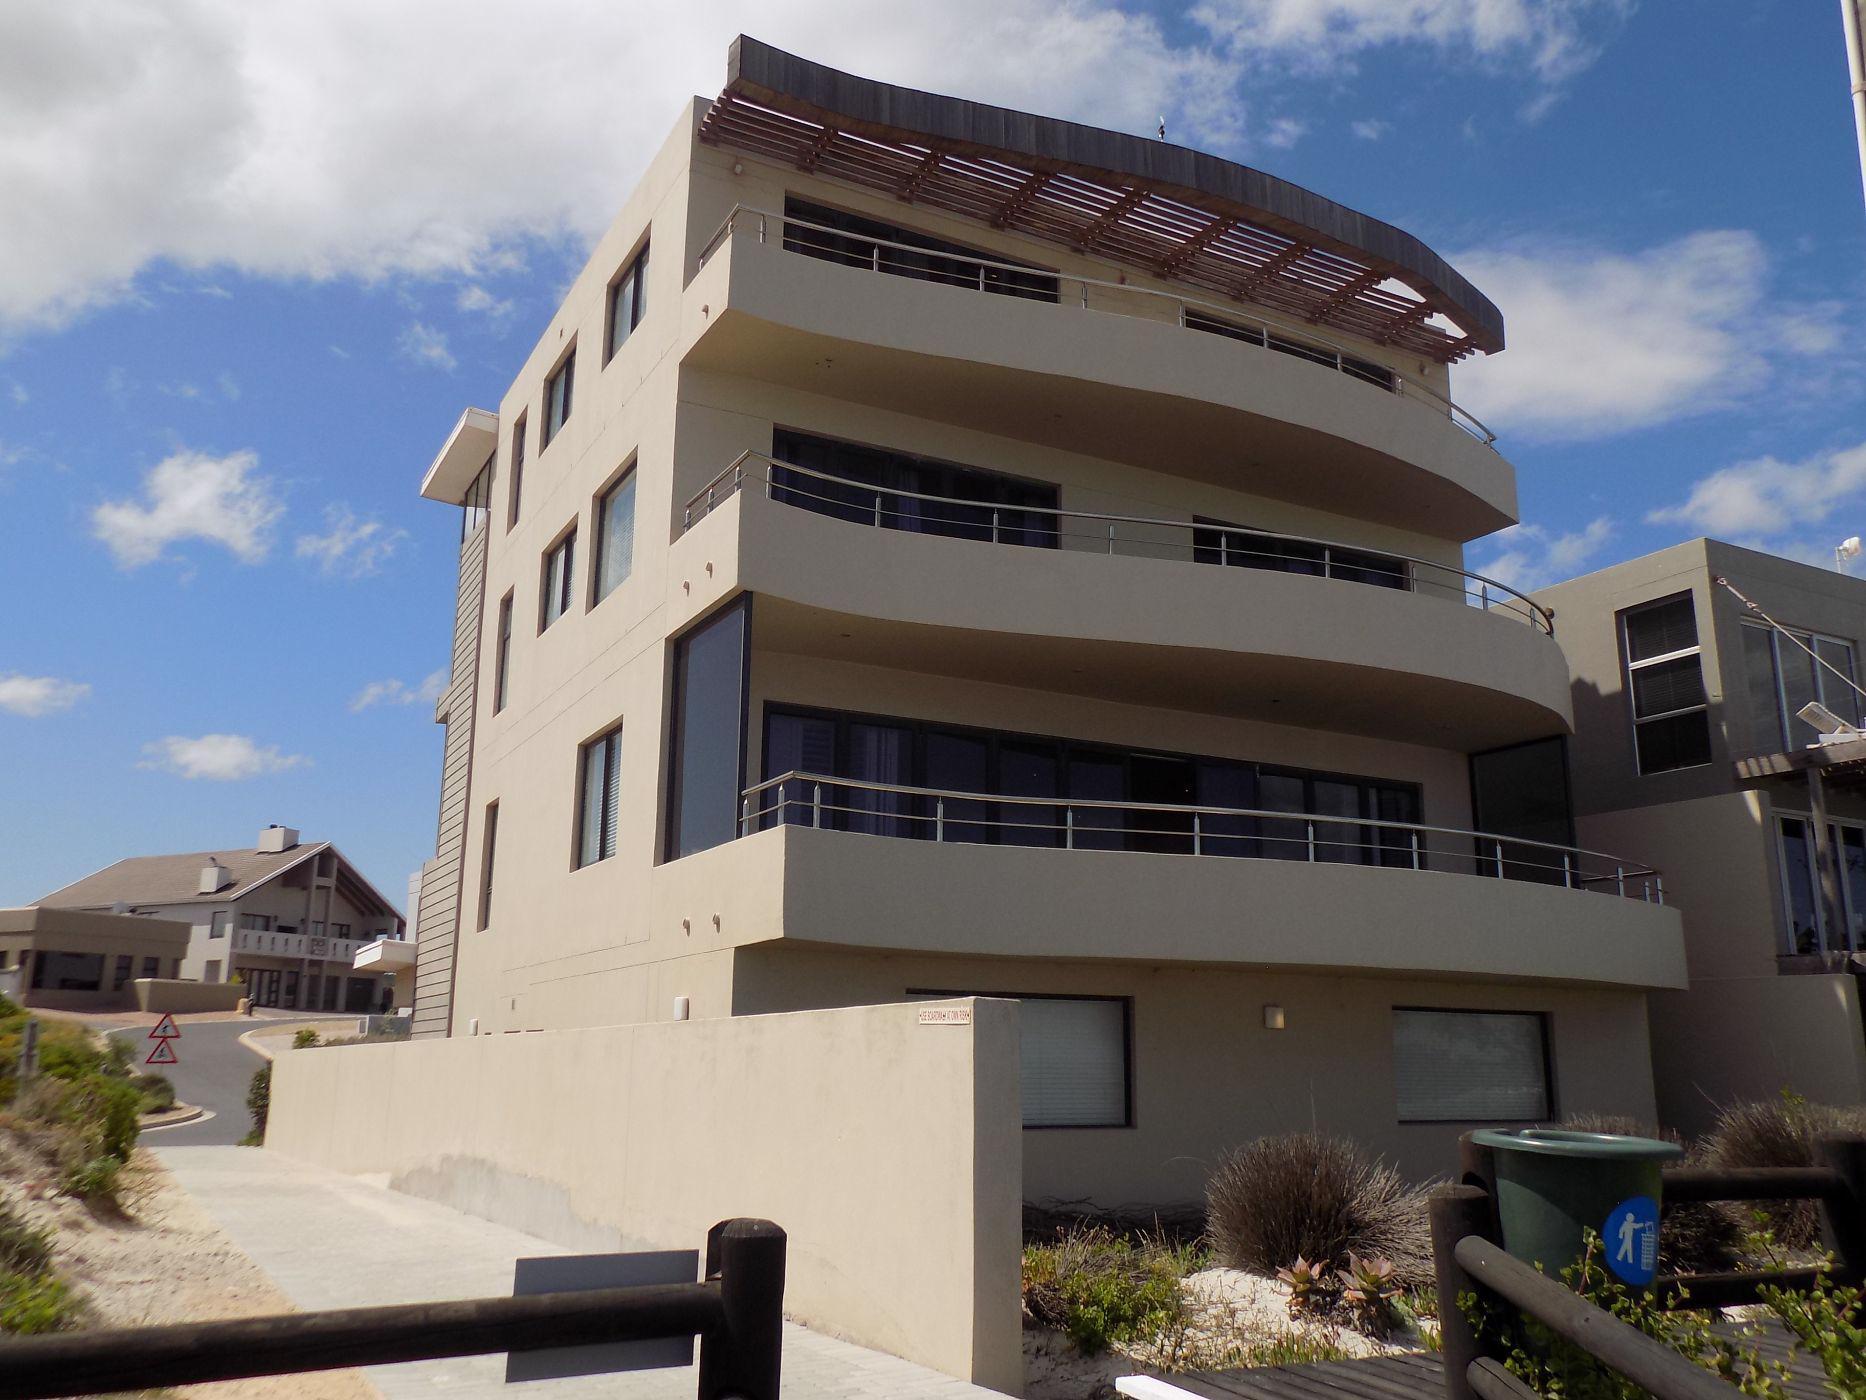 5 bedroom house for sale in Calypso Beach